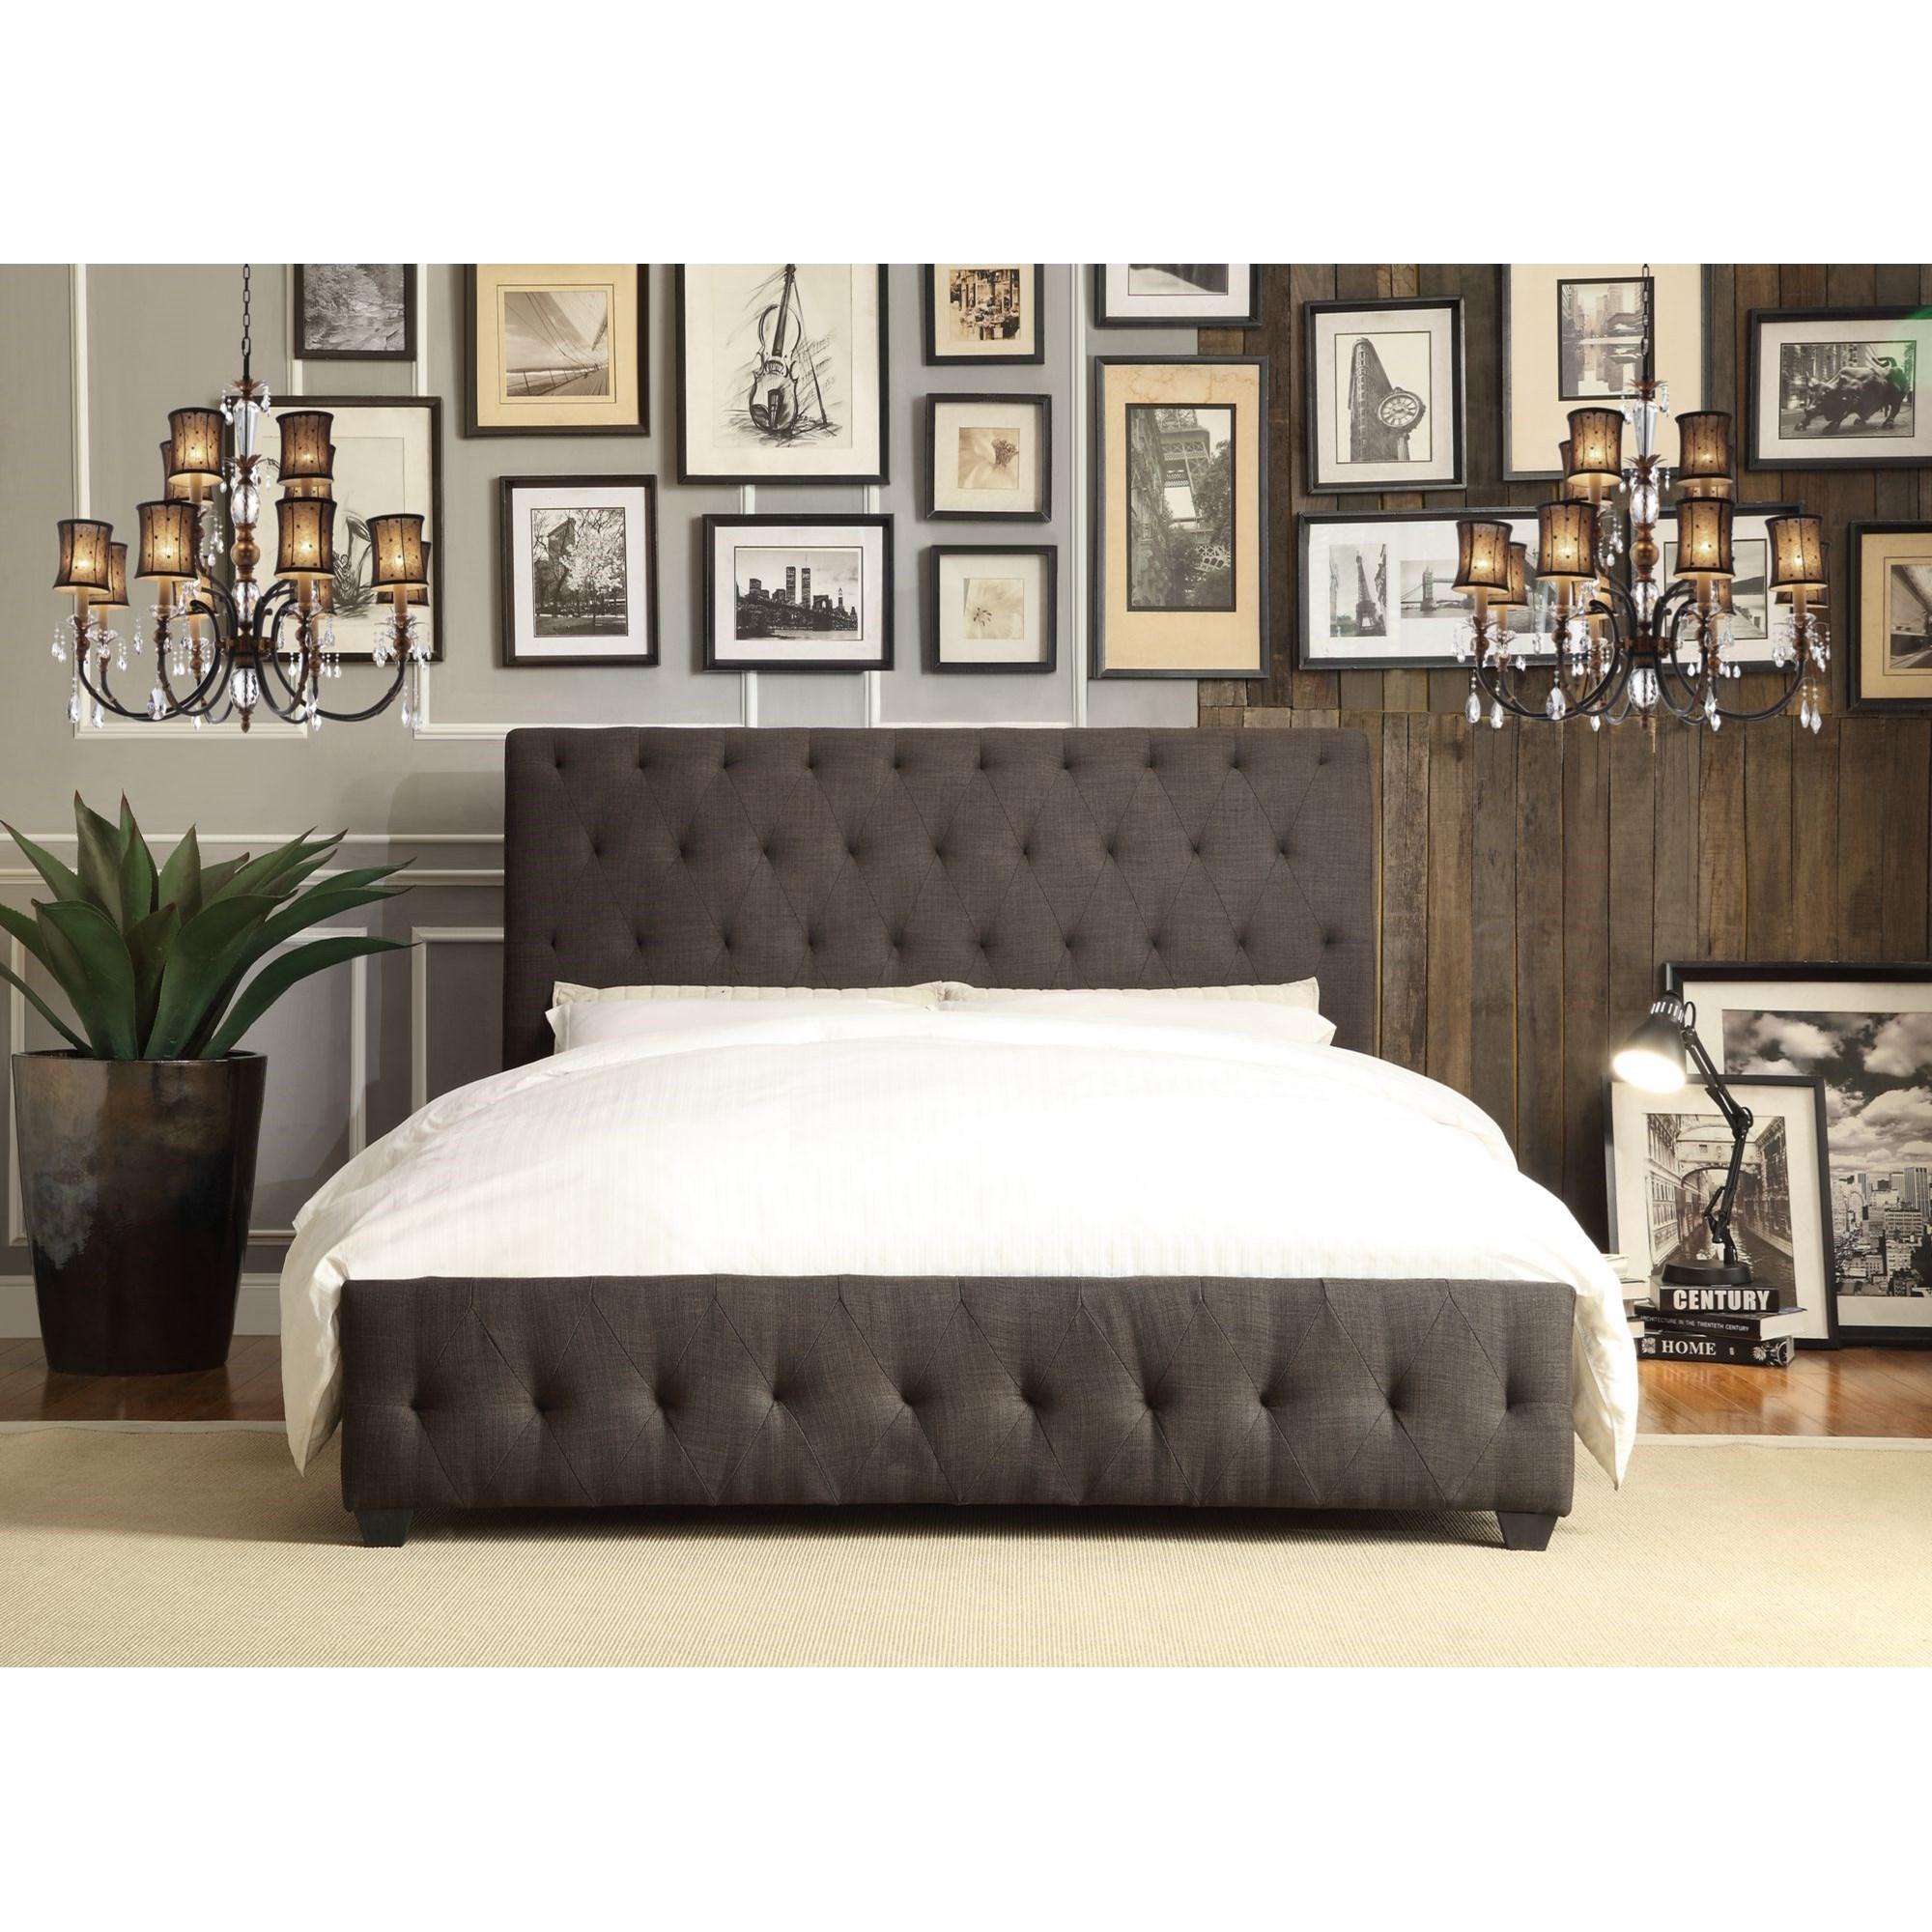 Homelegance Baldwyn Contemporary Full Upholstered Platform Bed With Tufting Darvin Furniture